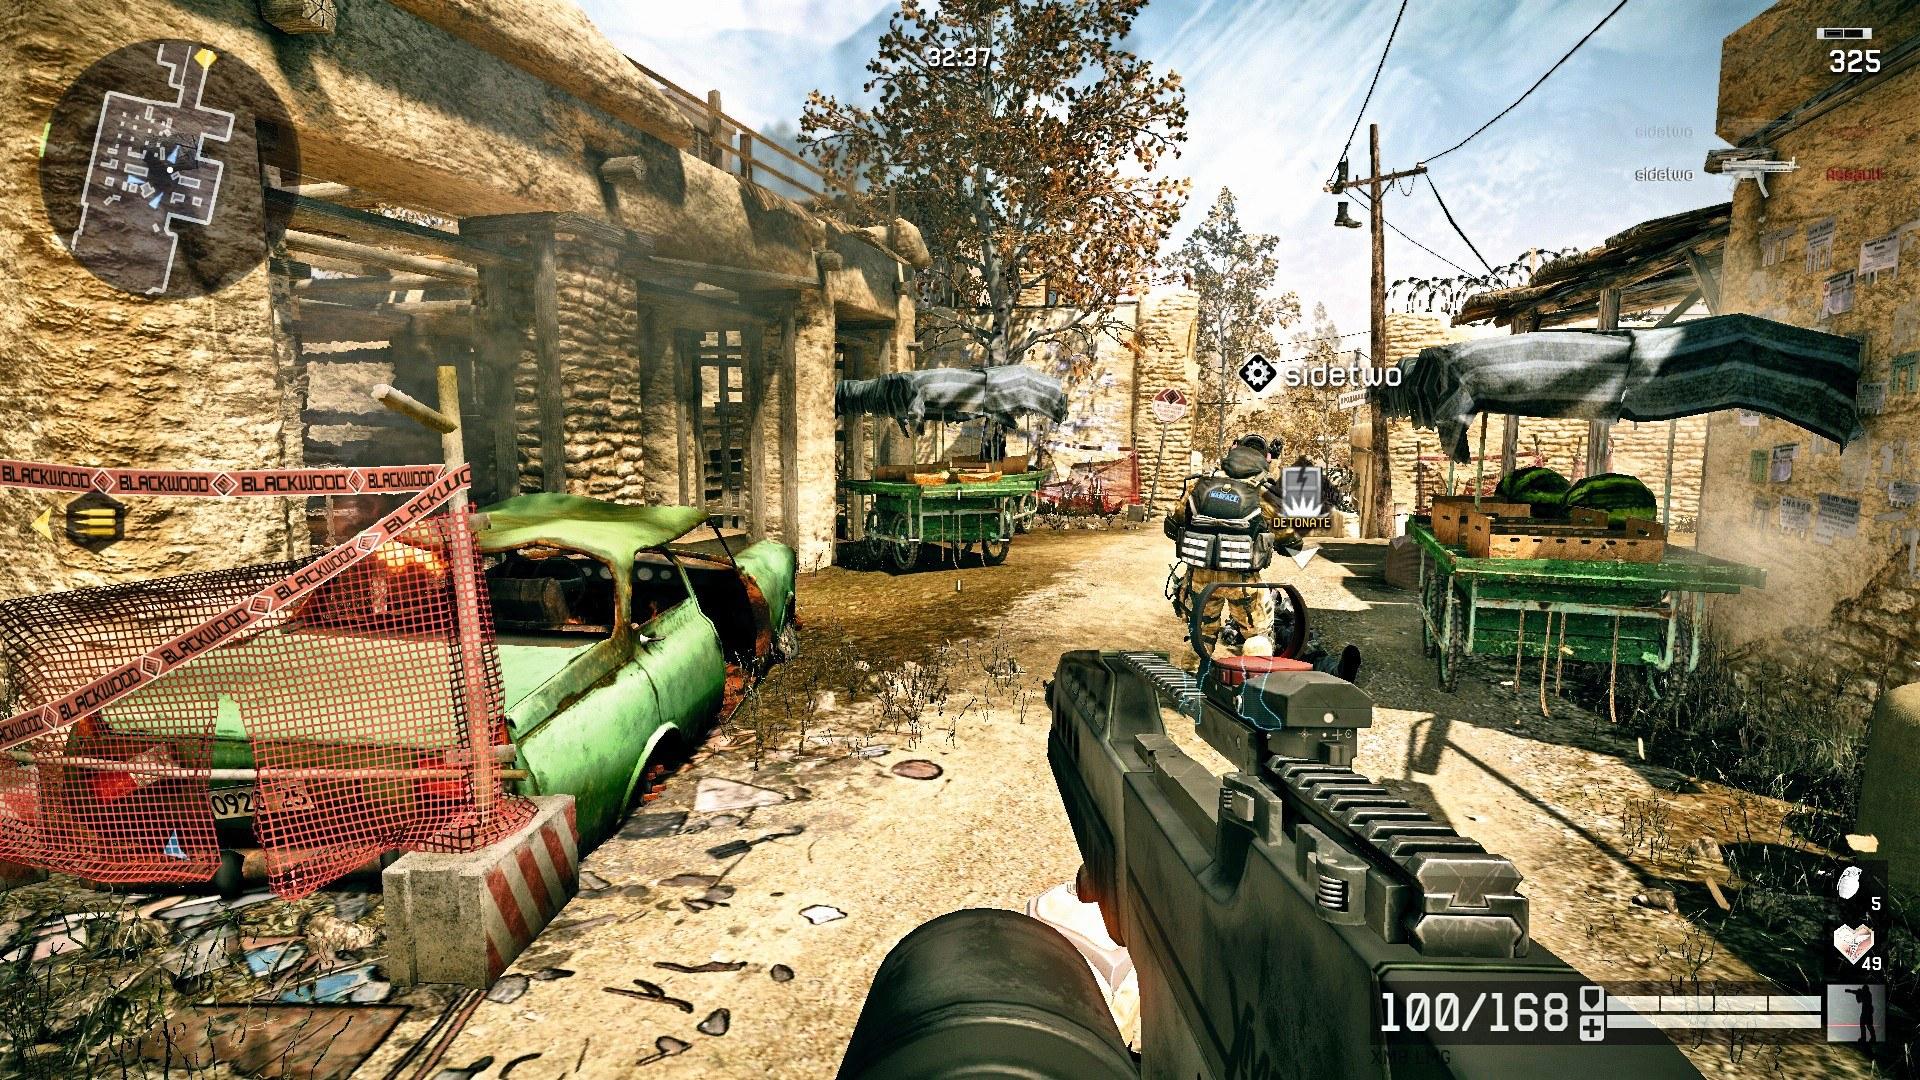 Warface by CRYTEK game development company